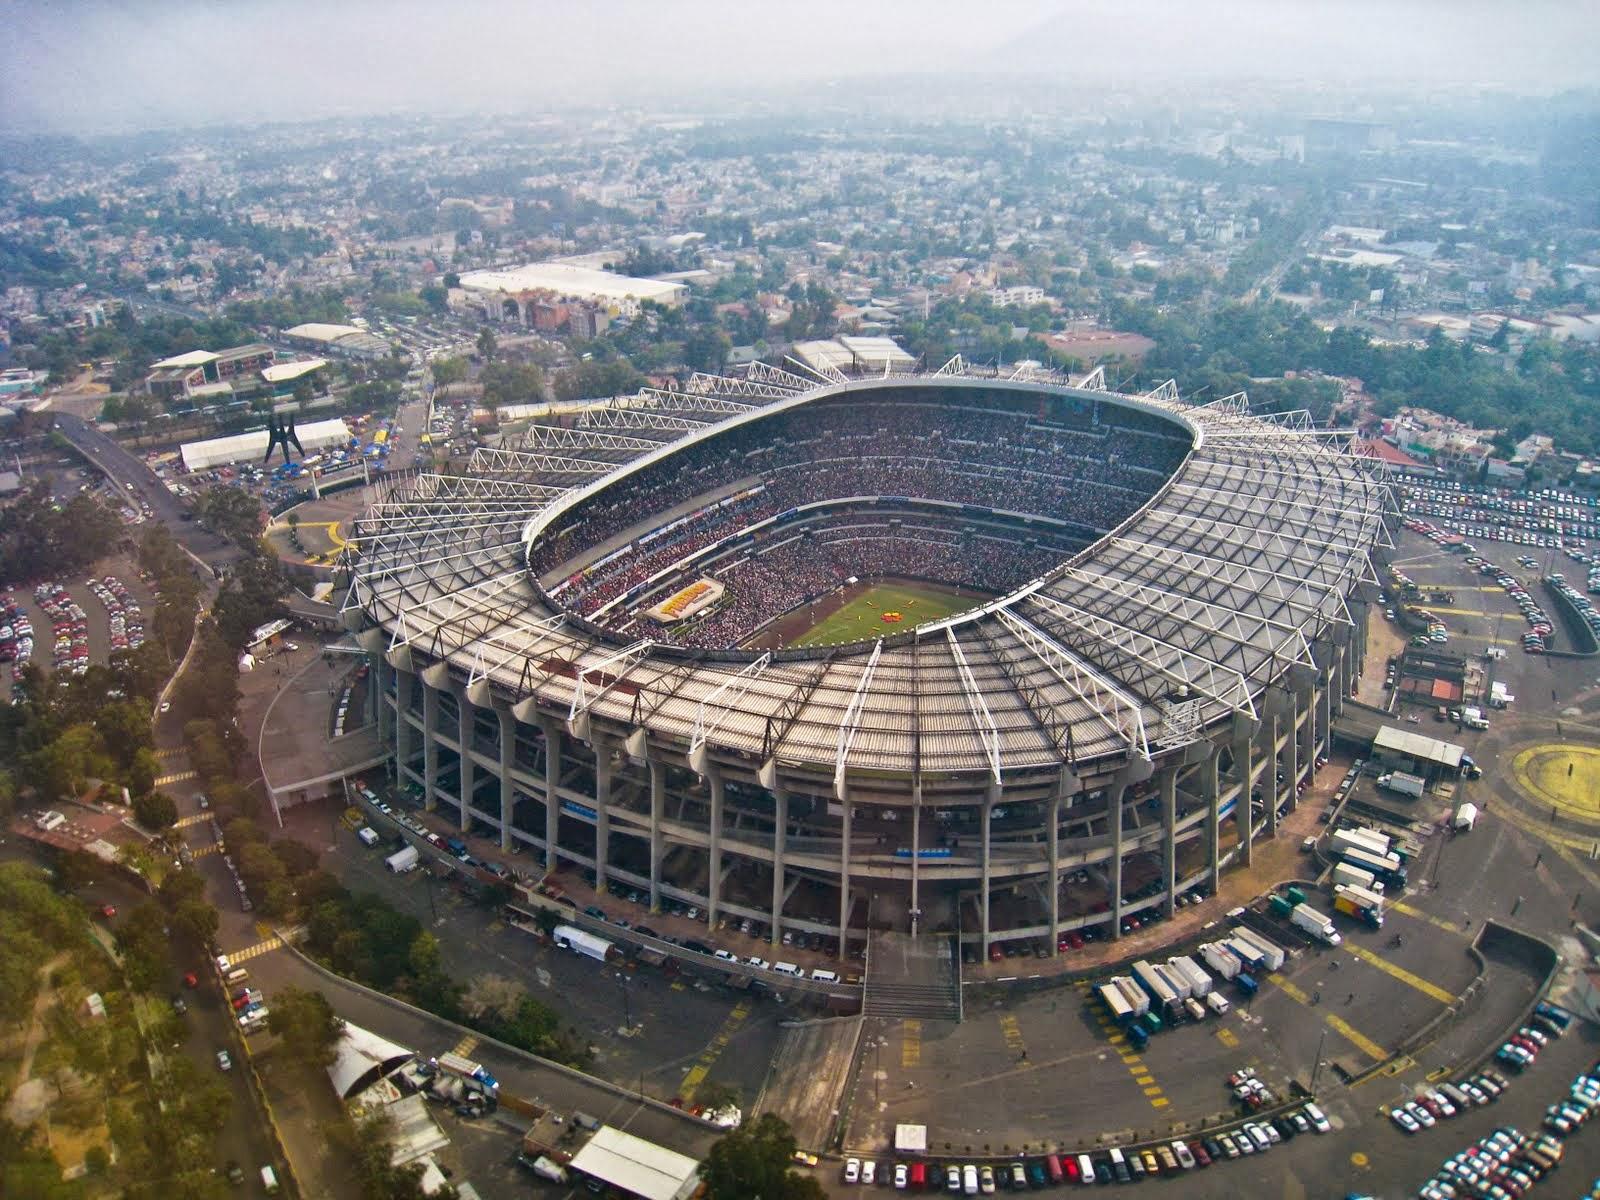 Amazing world modern football stadiums - Construcciones benjoal ...